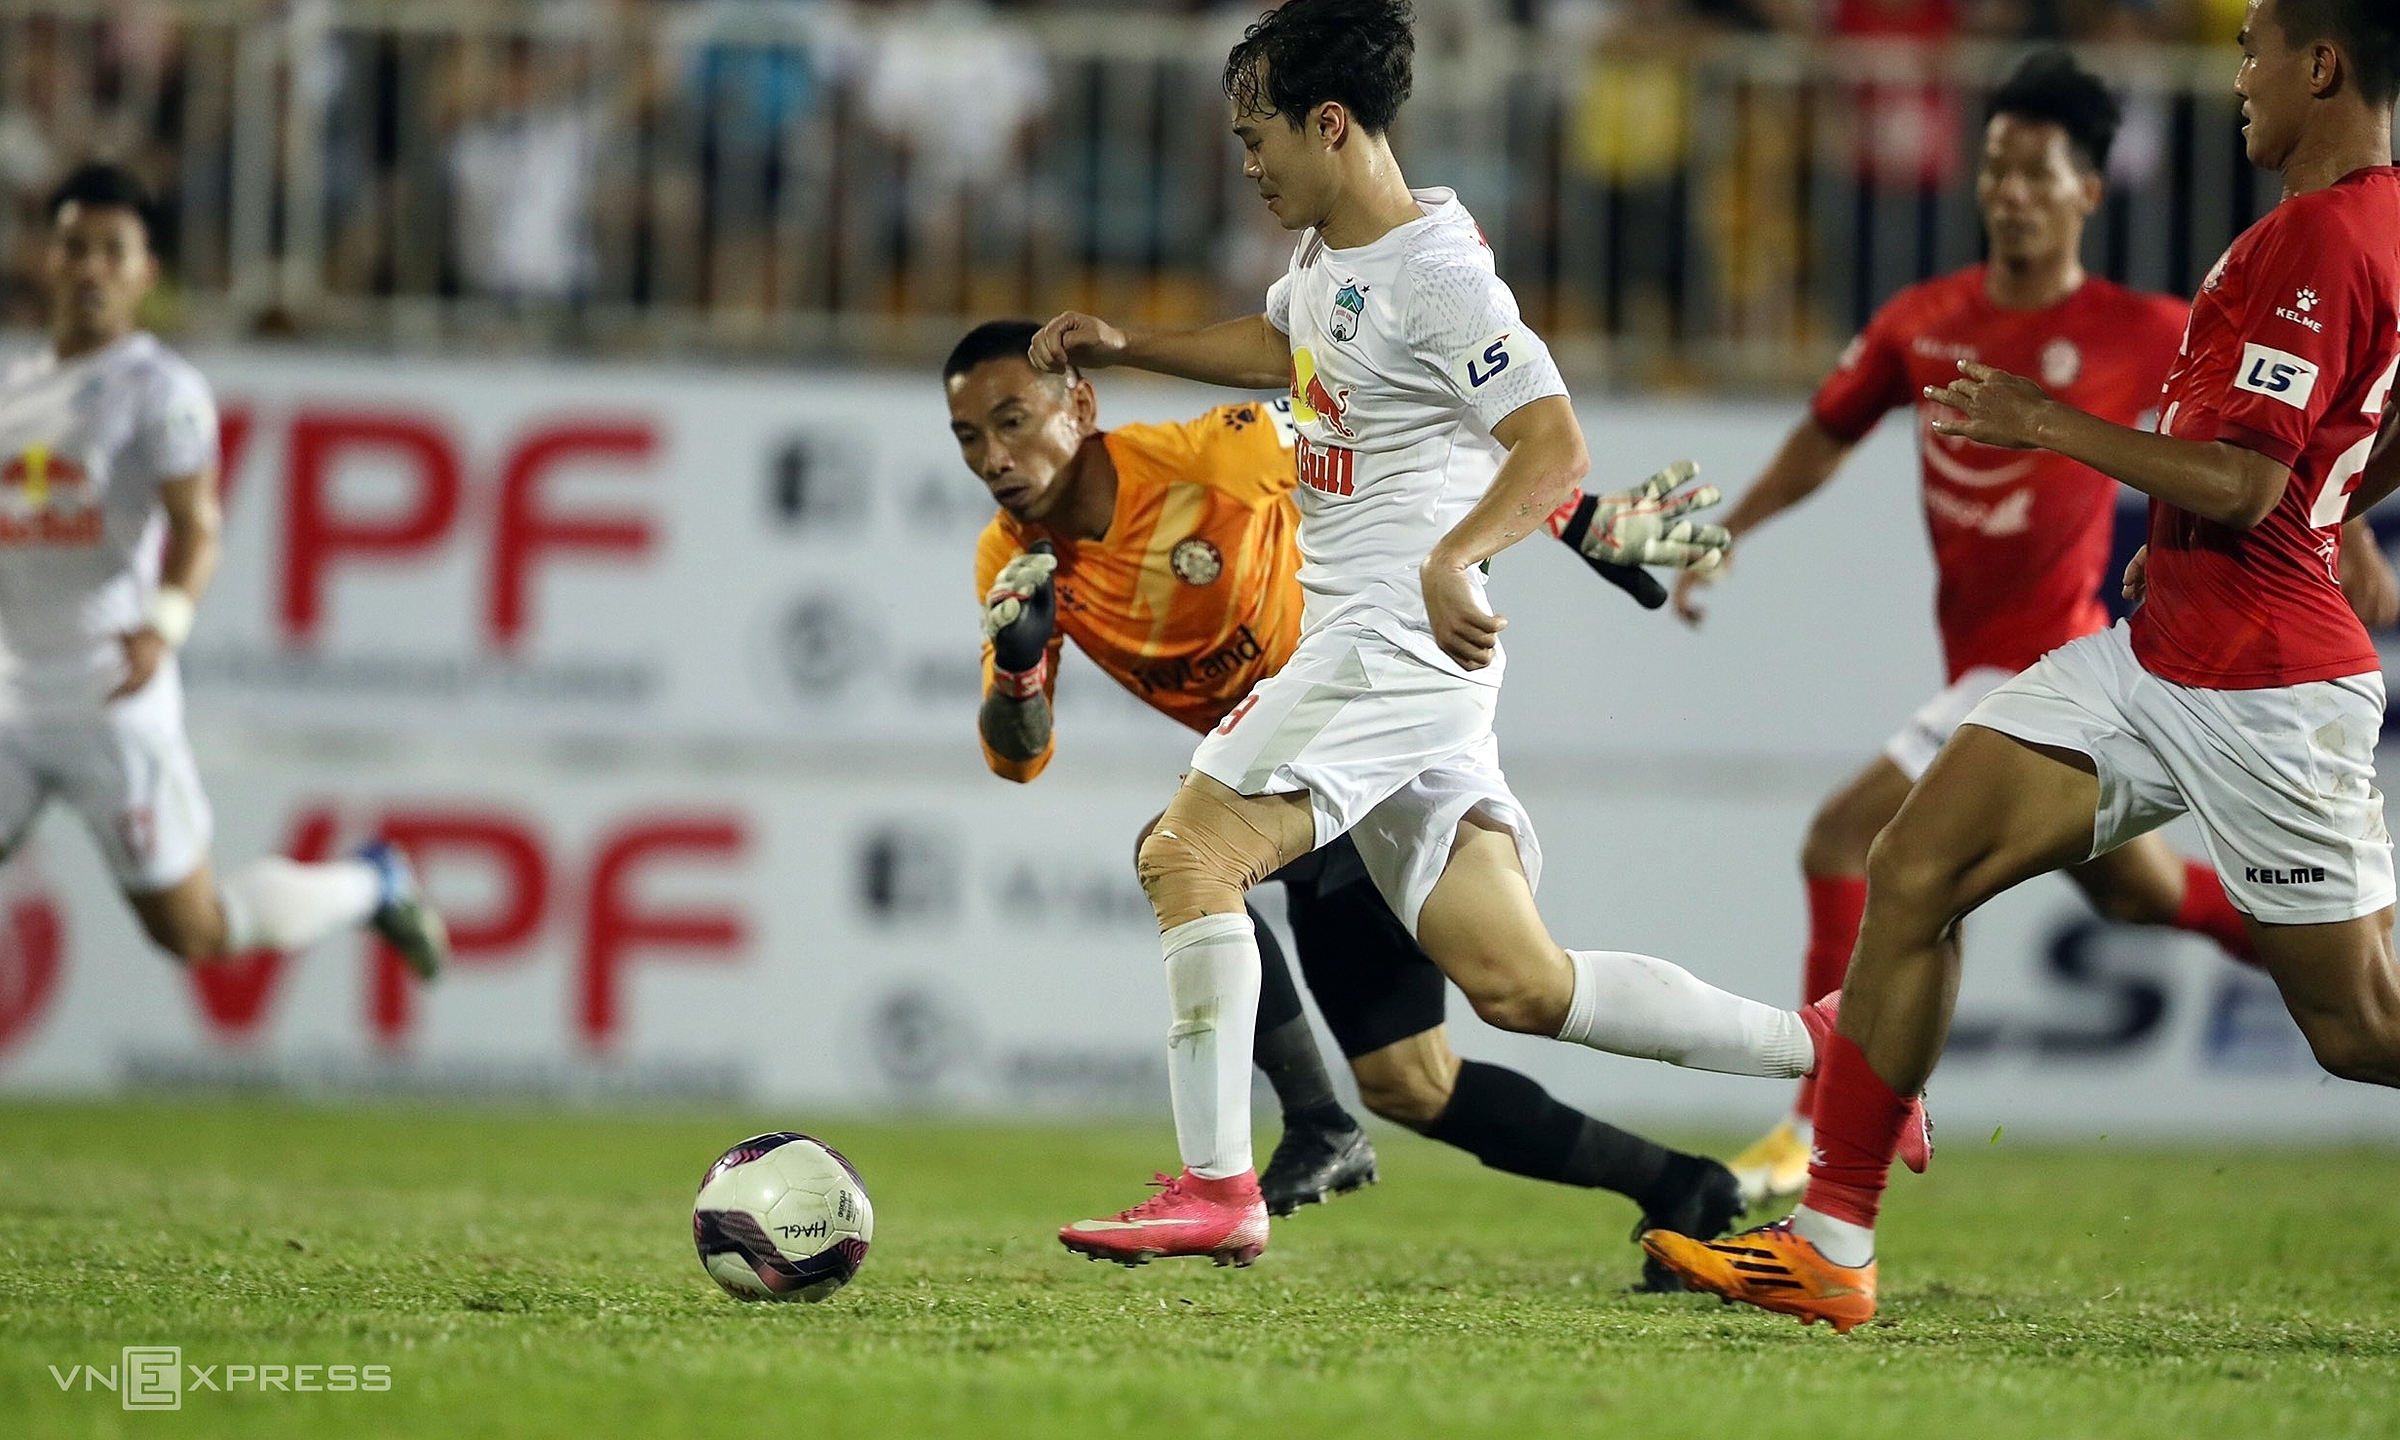 Van Toan ทำประตูที่สามใน V-League ฤดูกาลนี้  ภาพ: Duc Dong